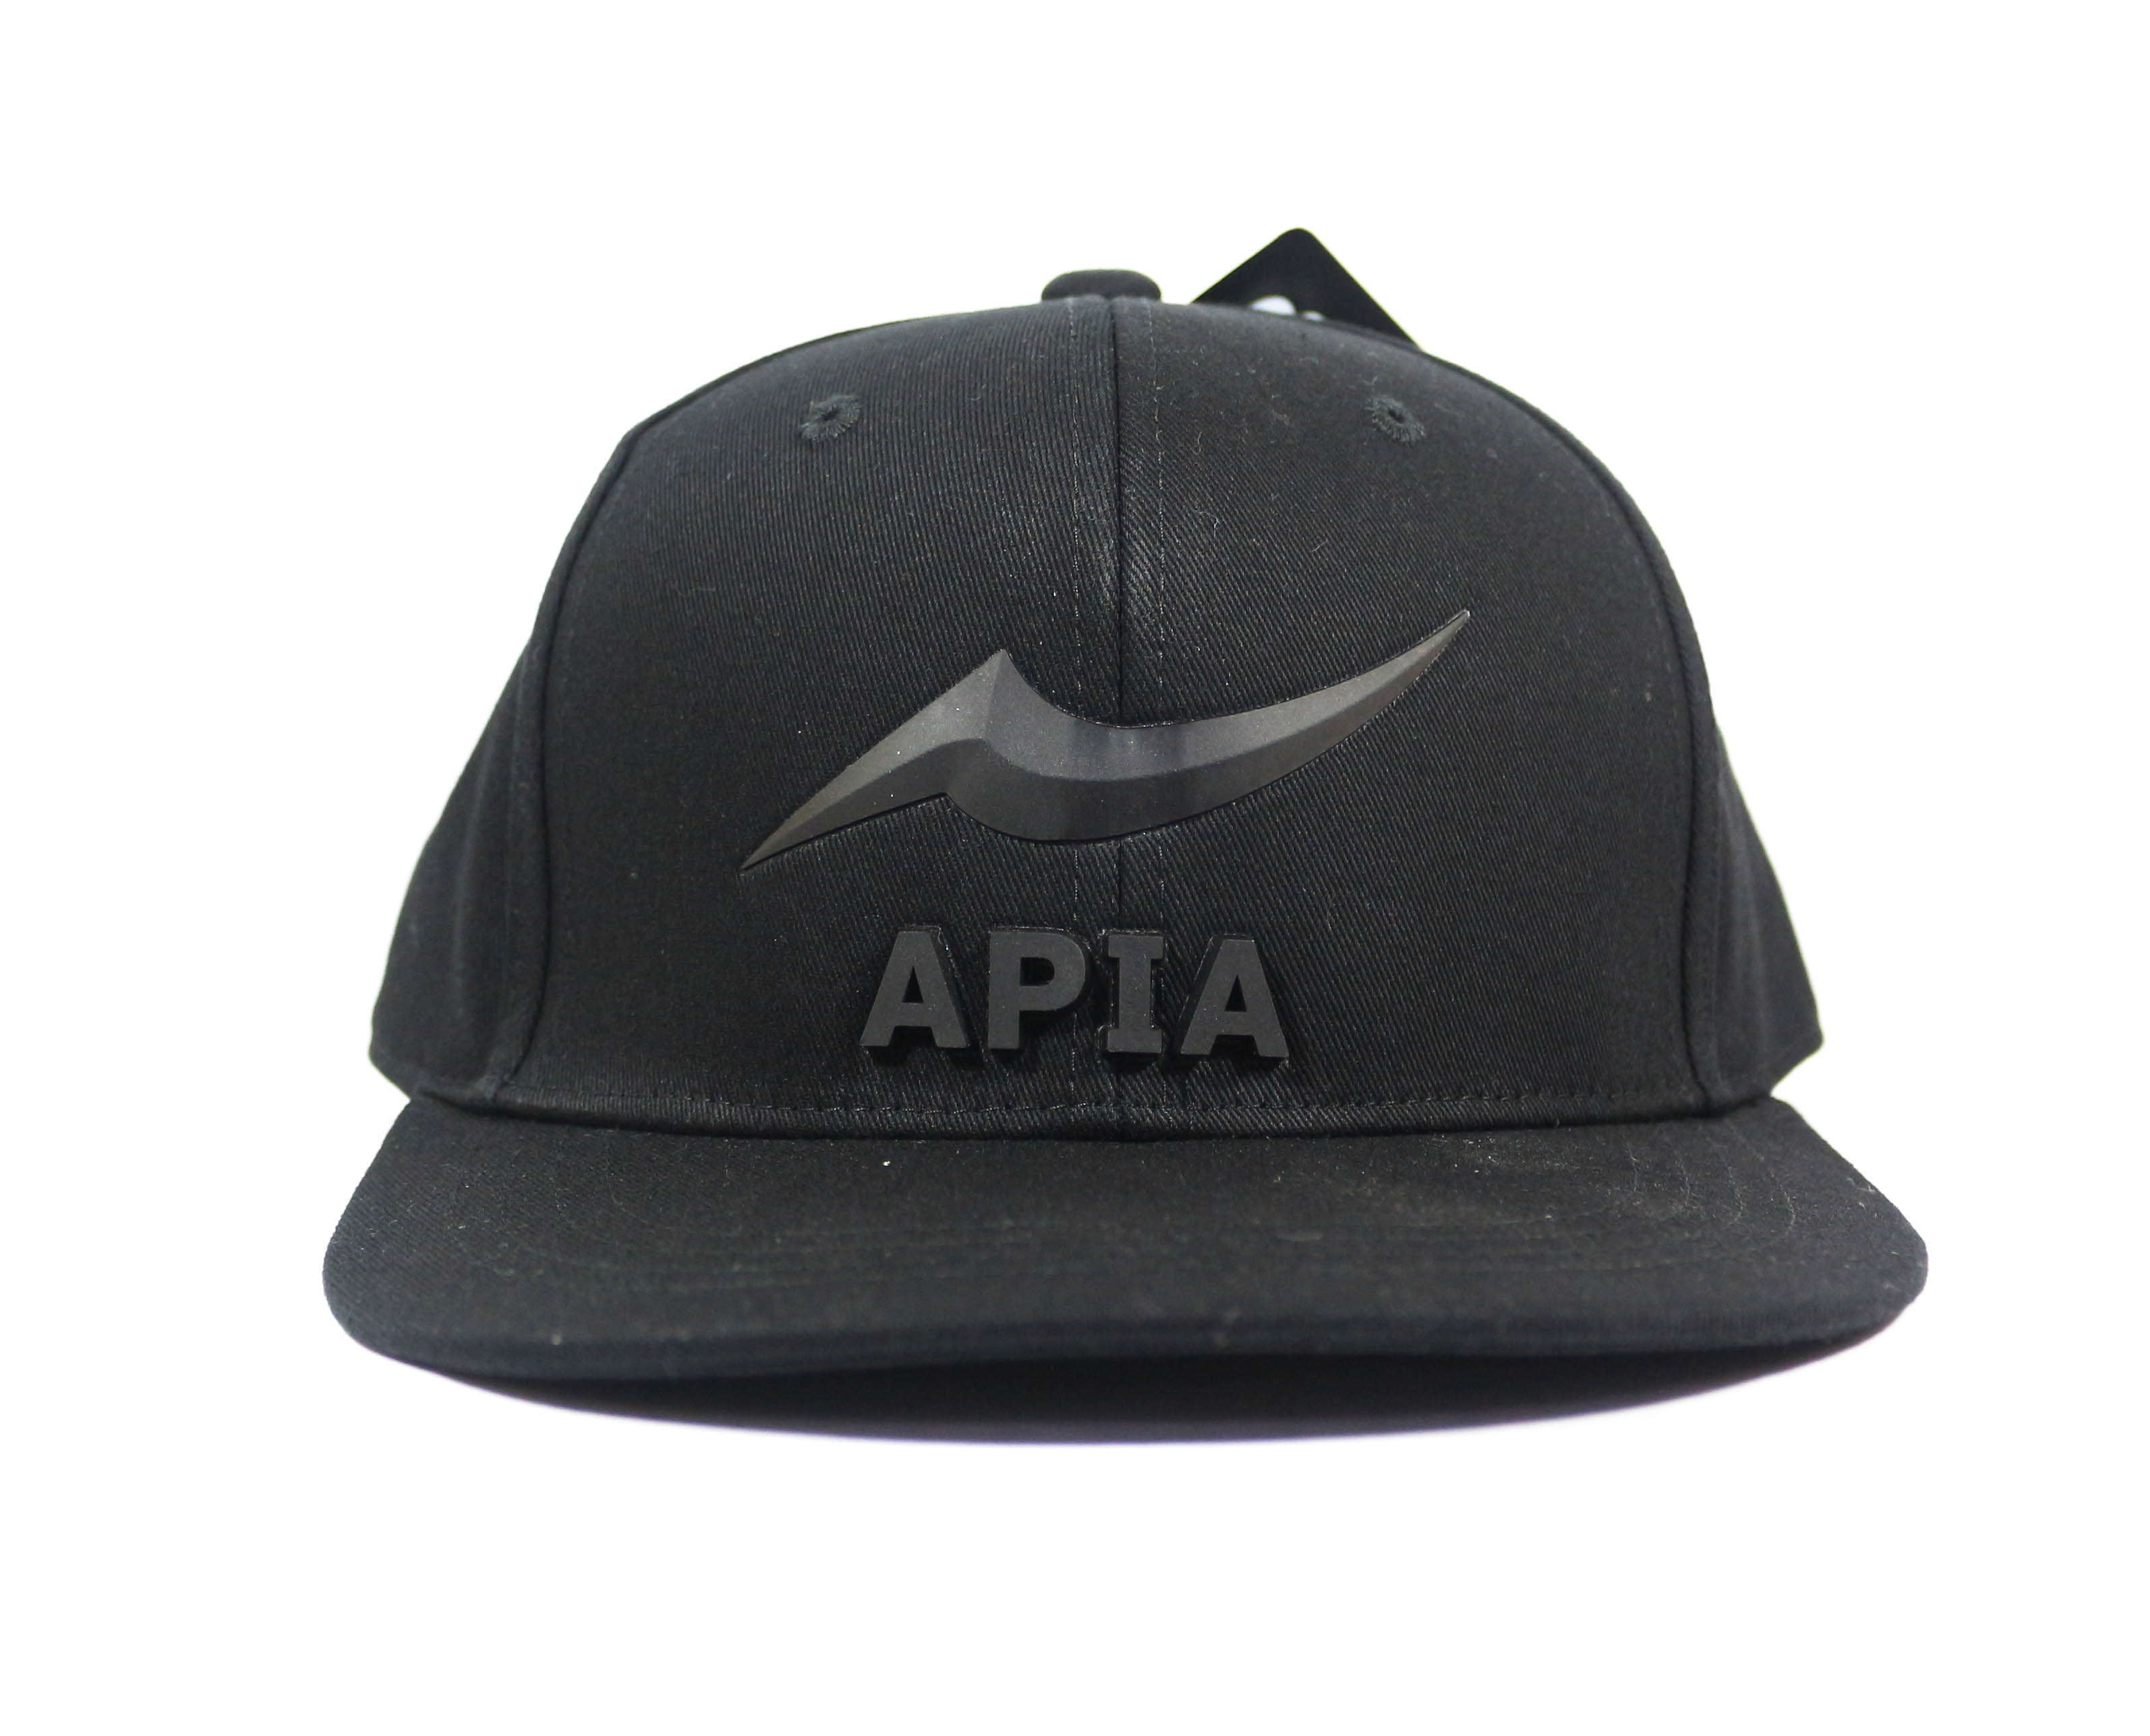 Apia Cap HF Flat-Cap Free Size Black Black (9280)